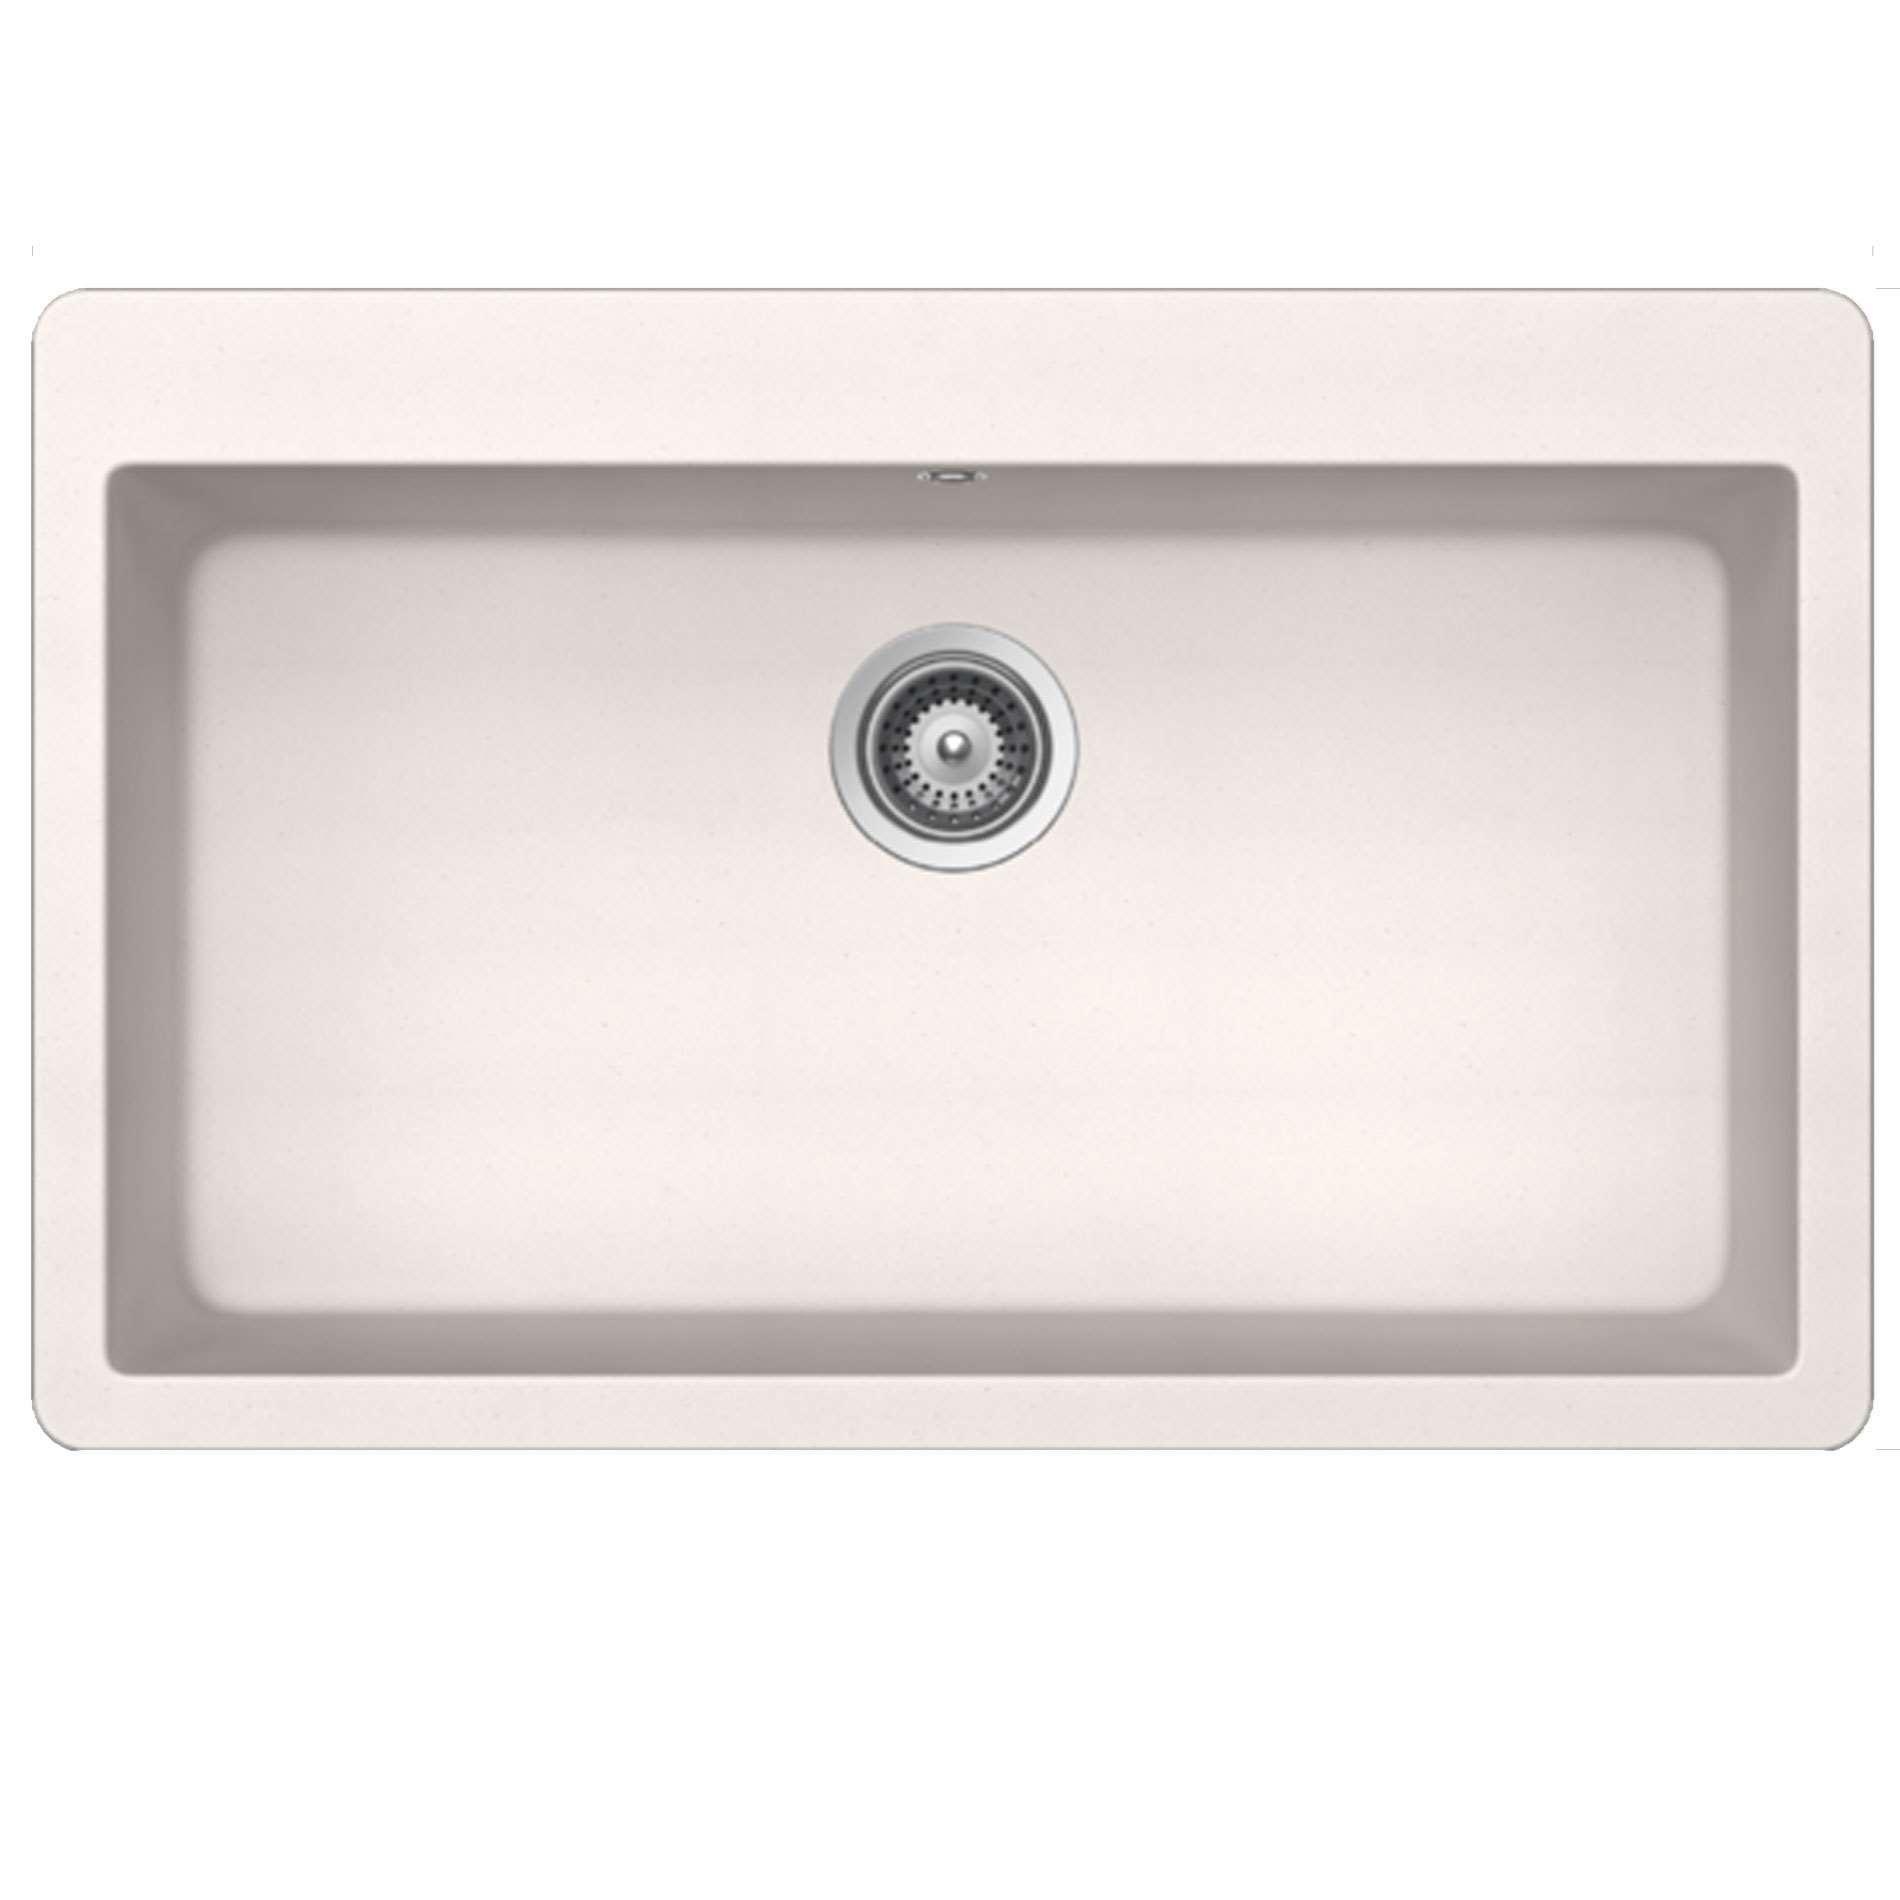 Picture of Montano MOT N 100XL U Polaris Granite Sink